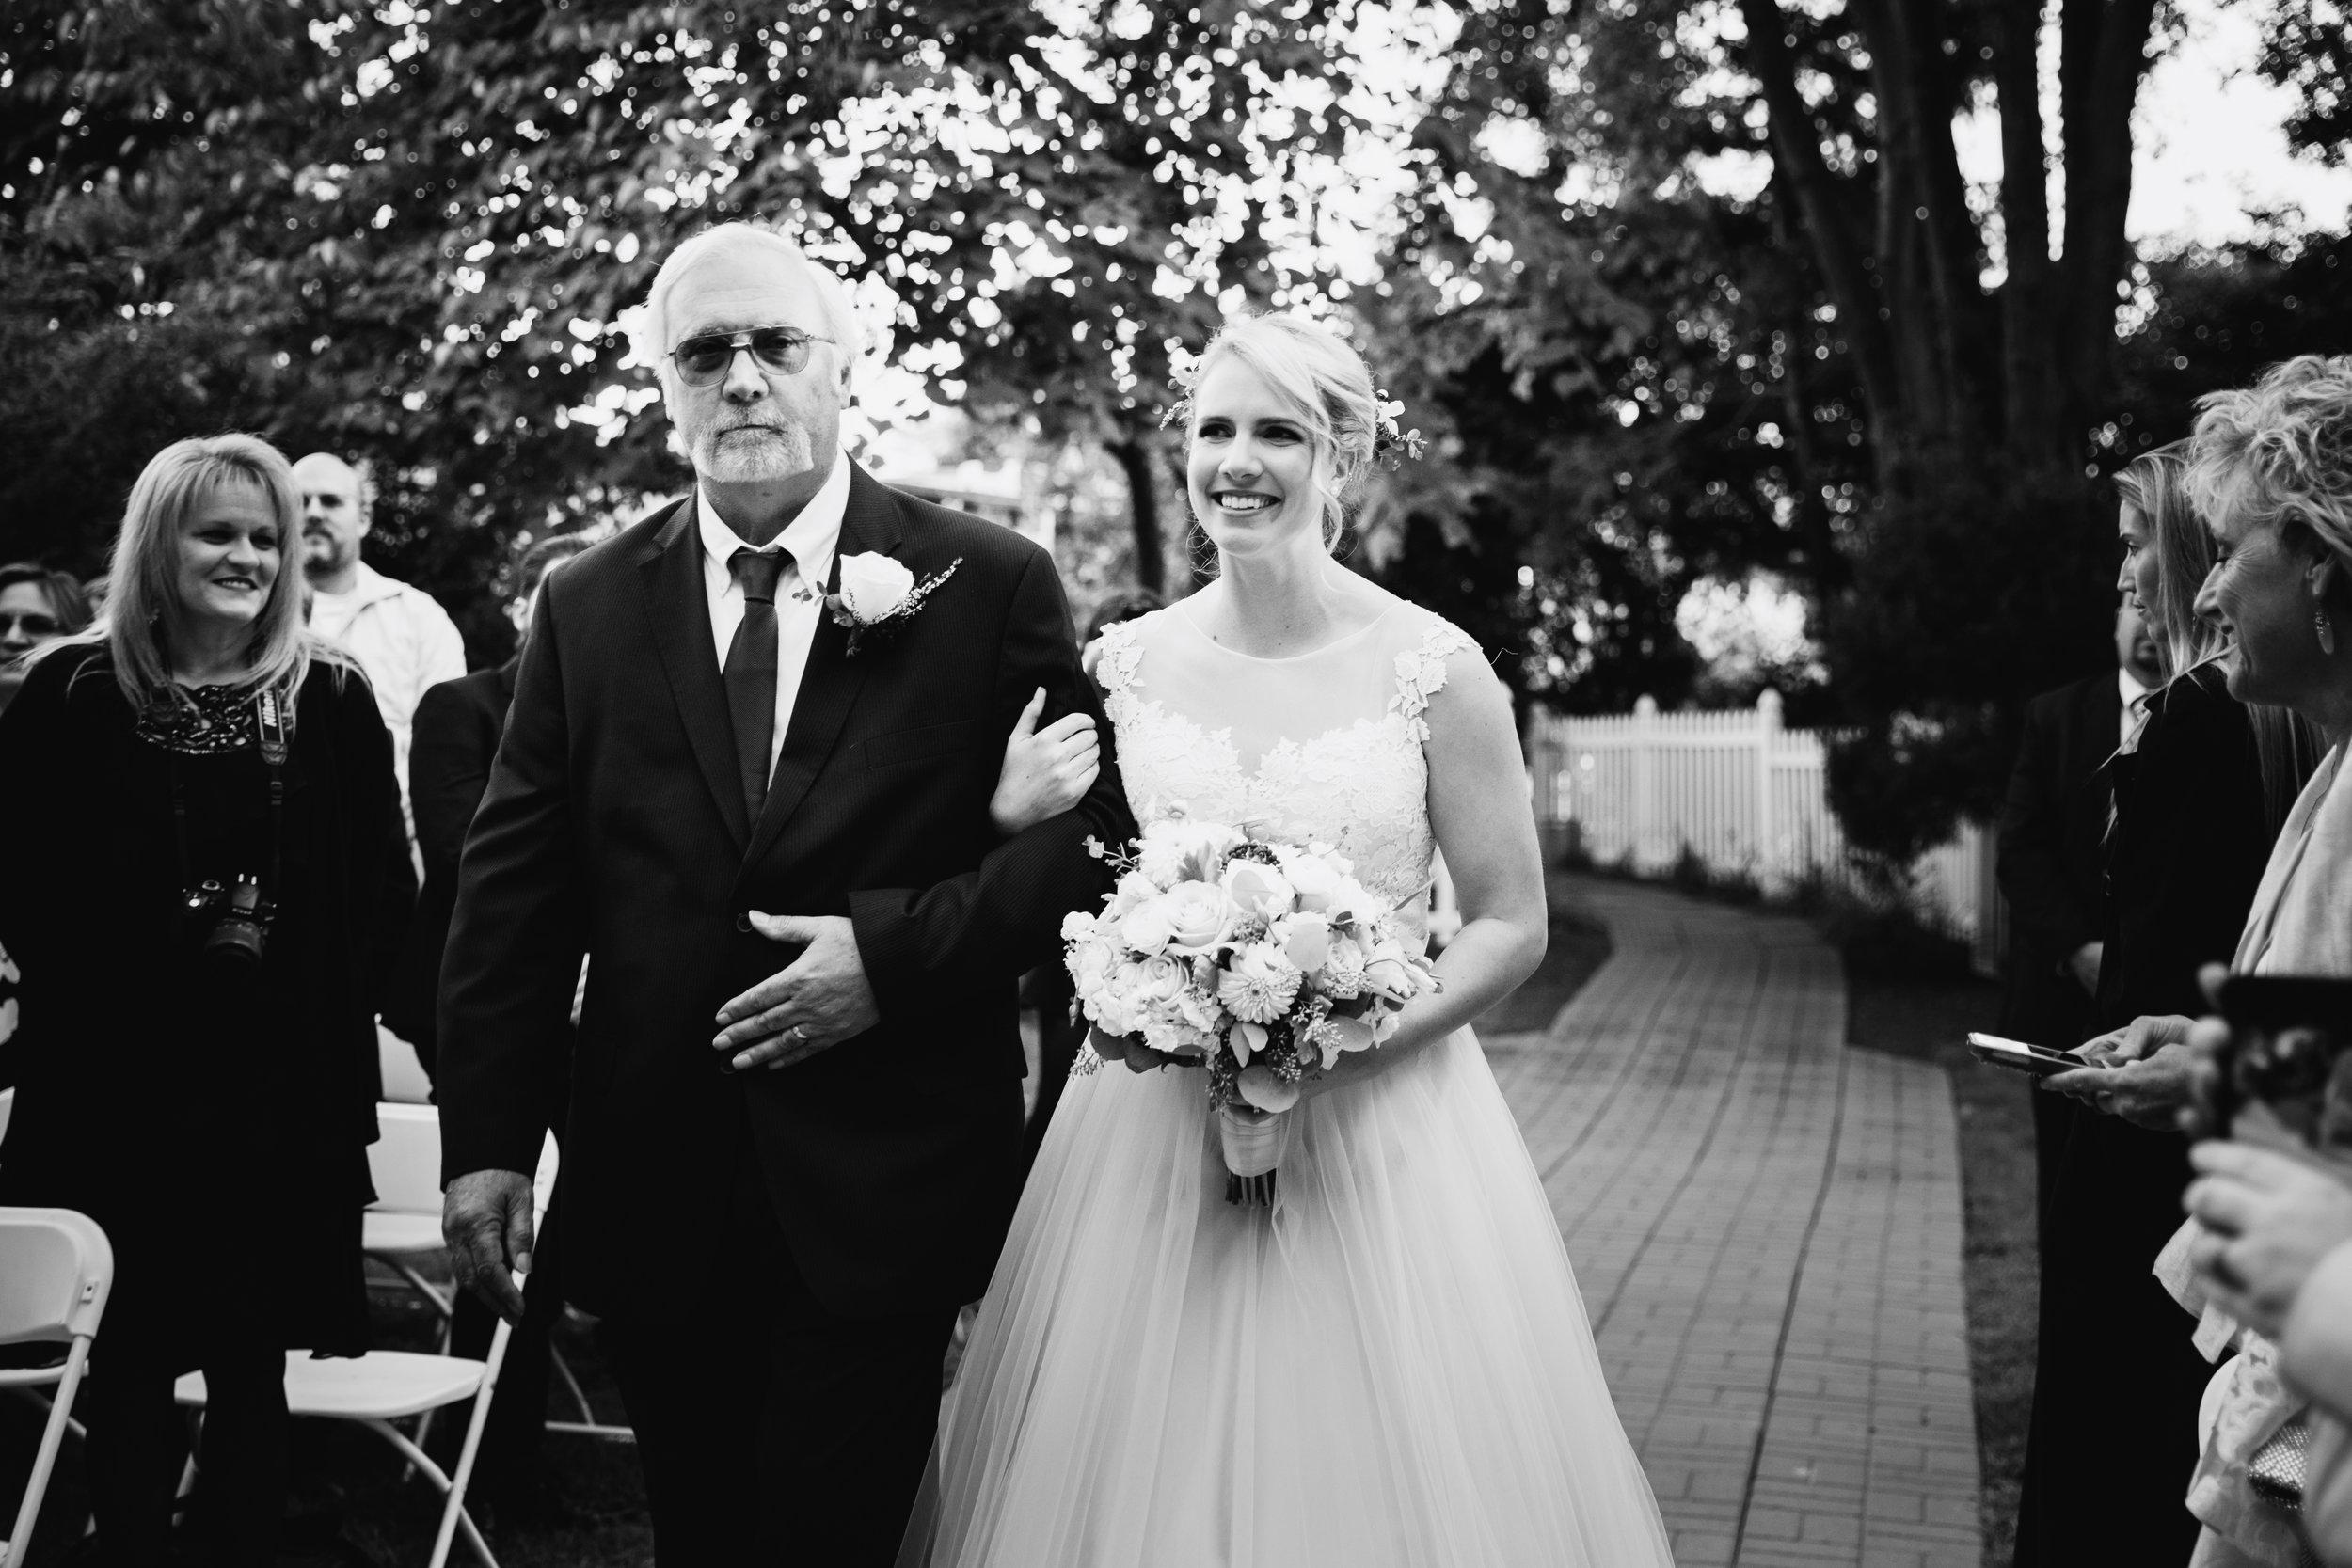 LA LUNA BANQUET HALL WEDDING BENSALEM - 045.jpg